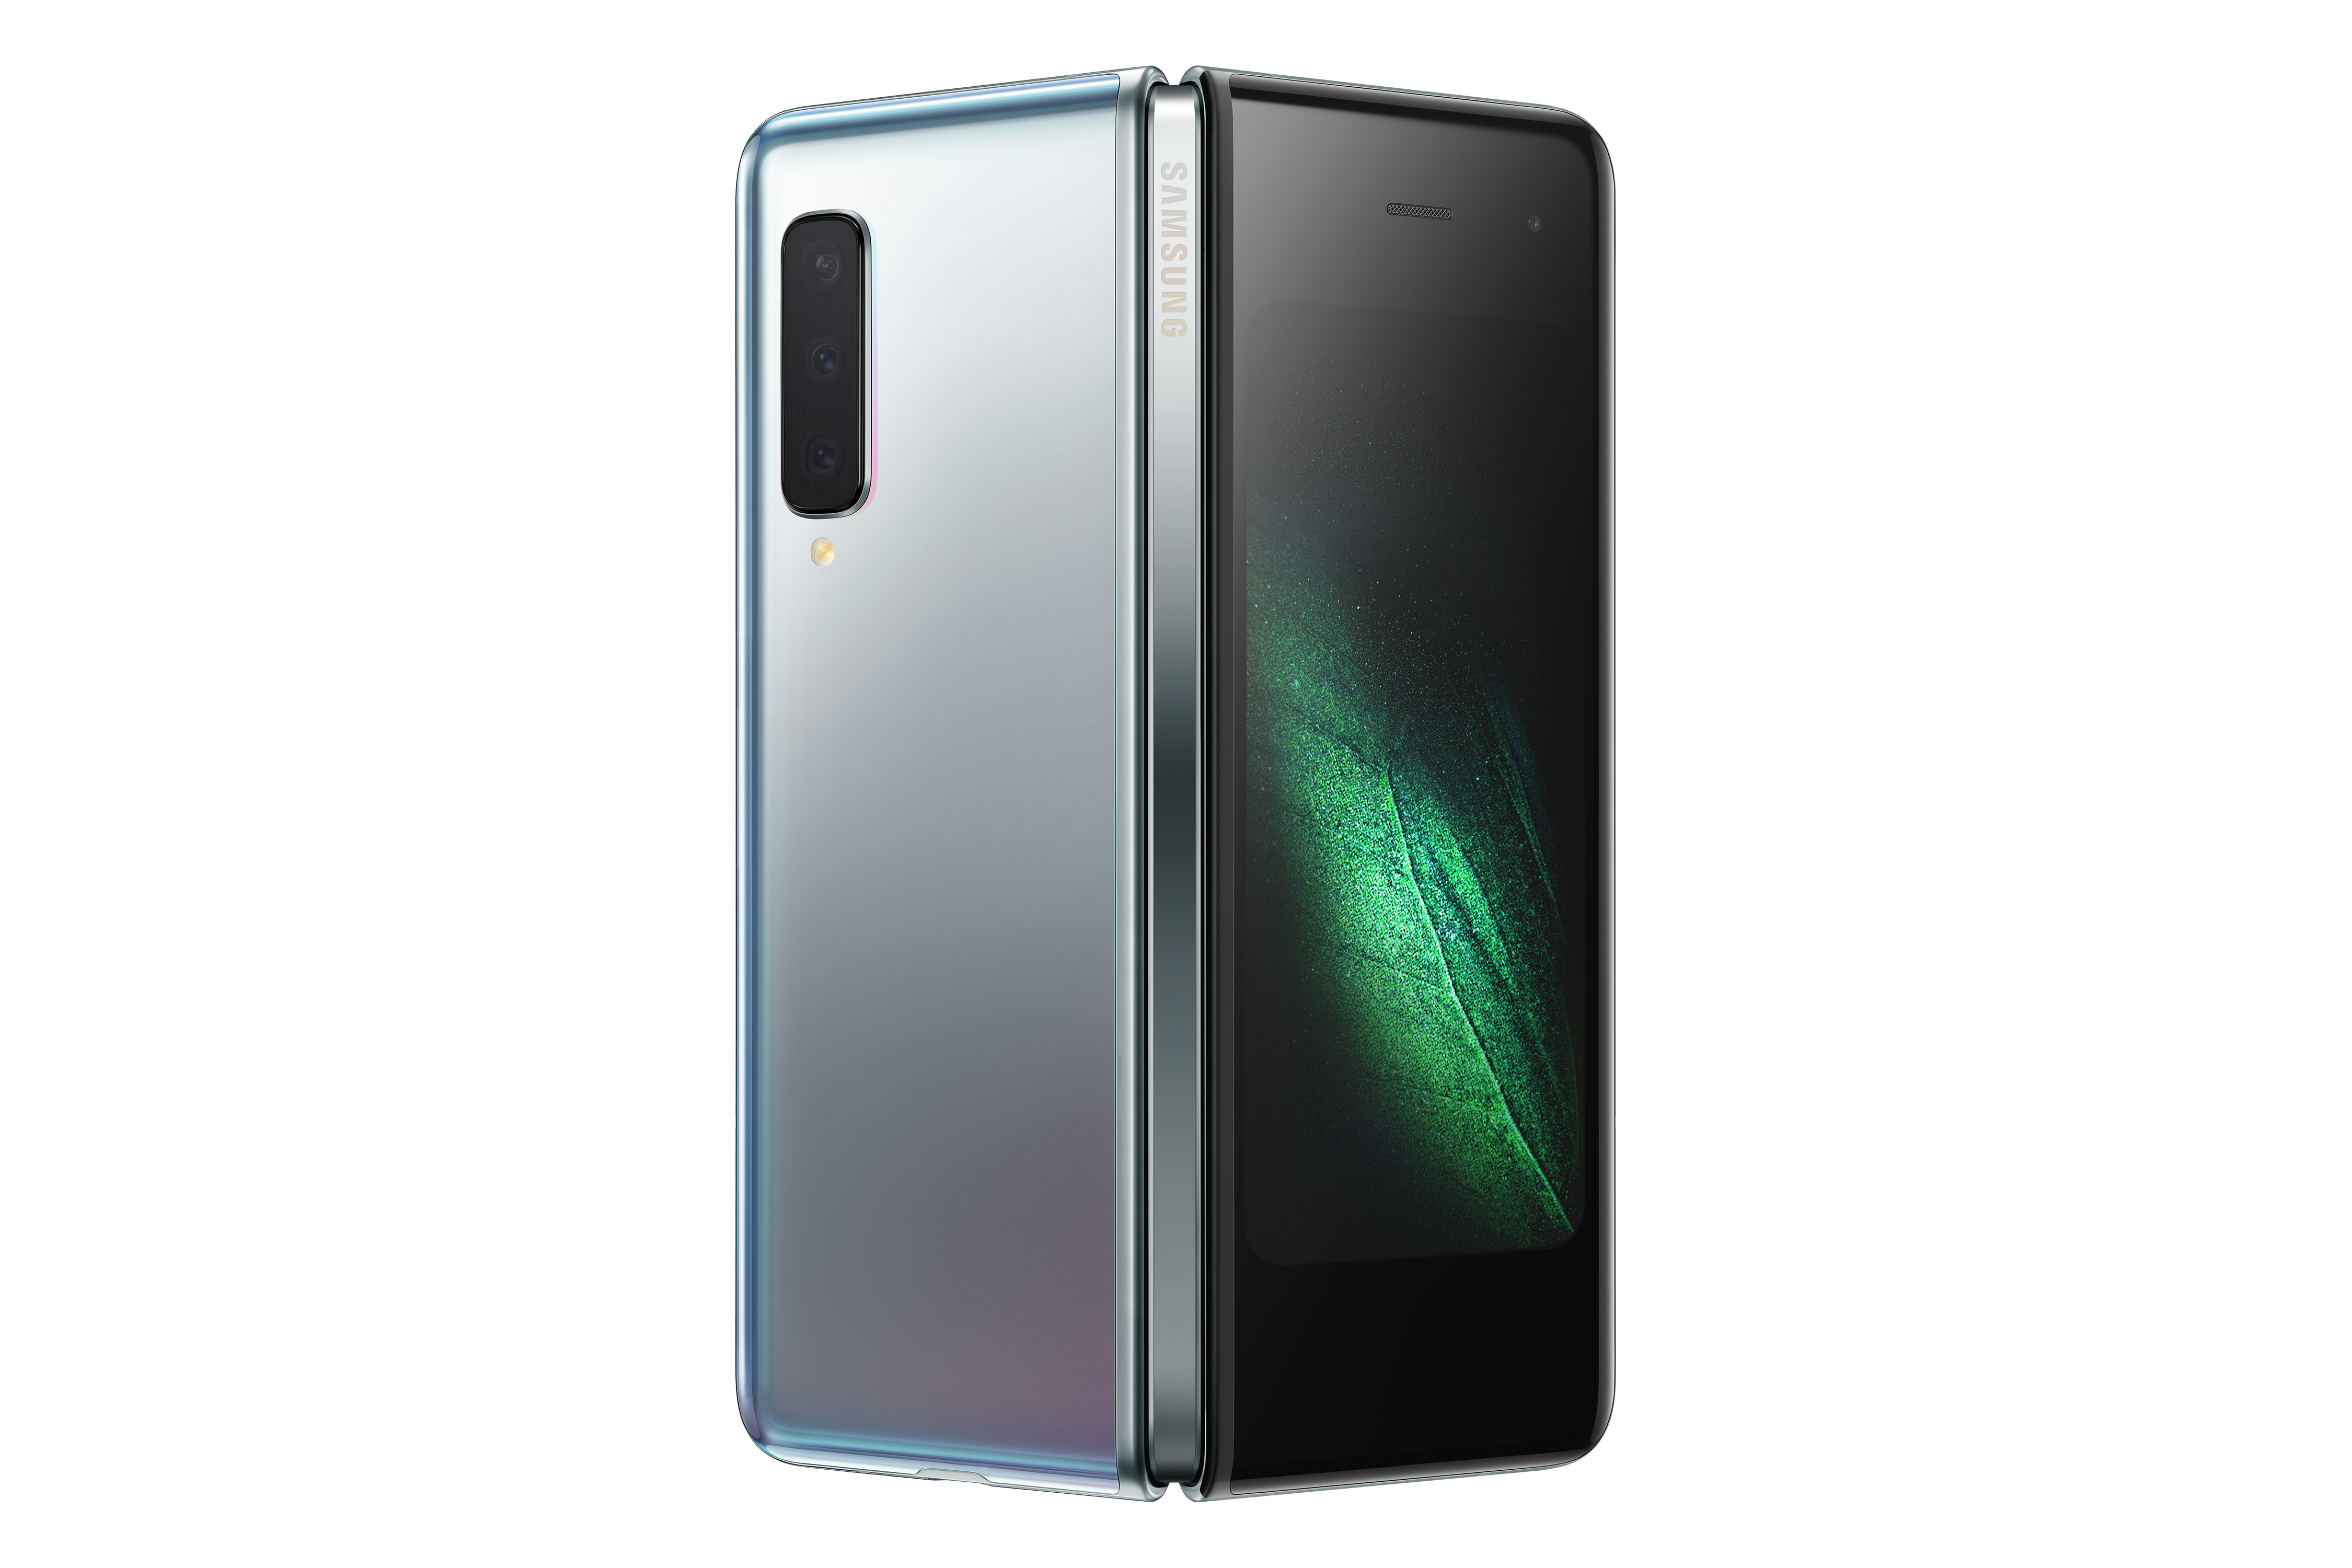 Samsung GALAXY FOLD va fi lansat in Septembrie, iata-i Schimbarile